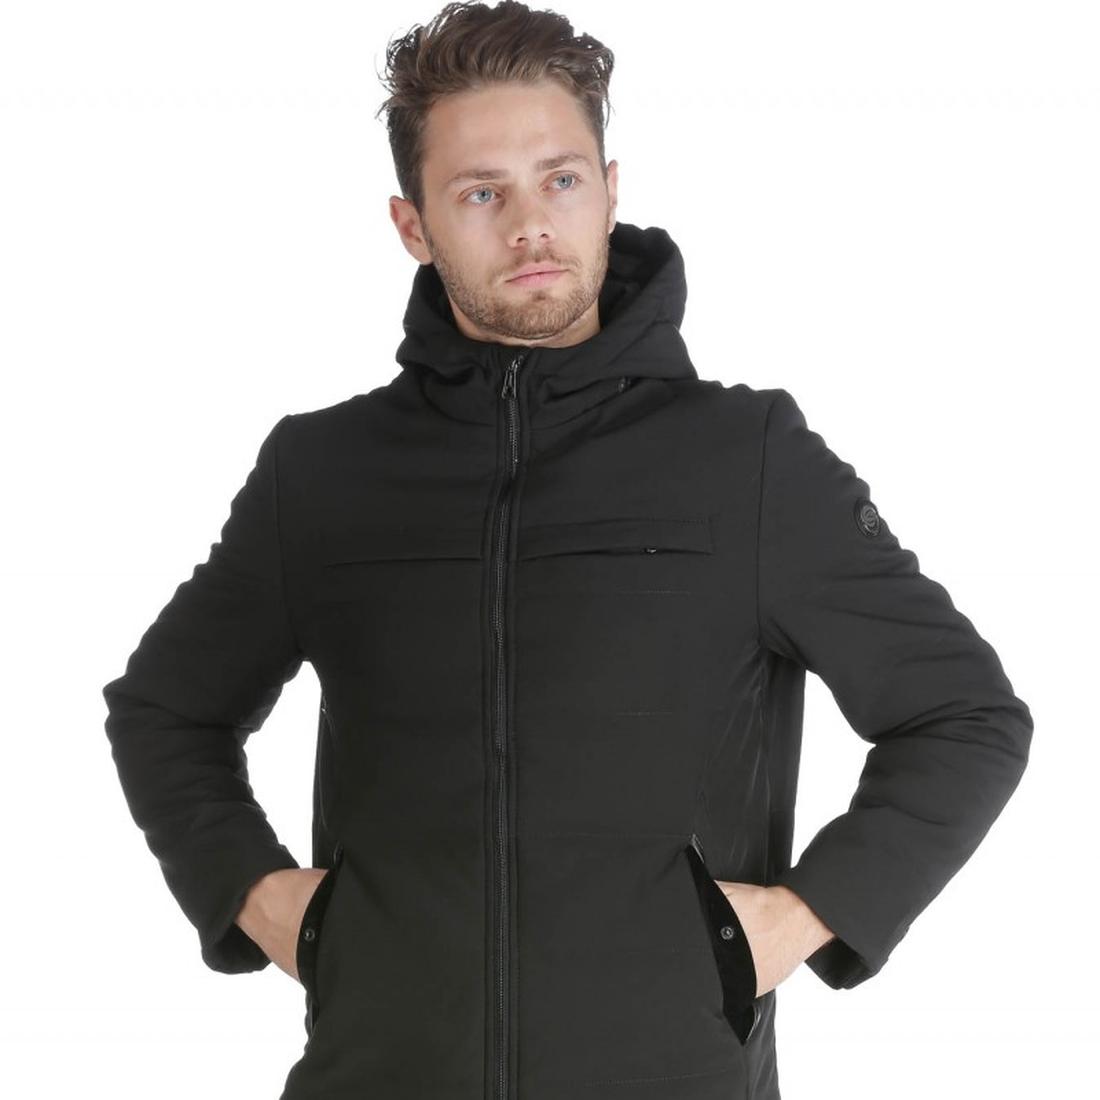 Jacket παντός καιρού για απόλυτη προστασία